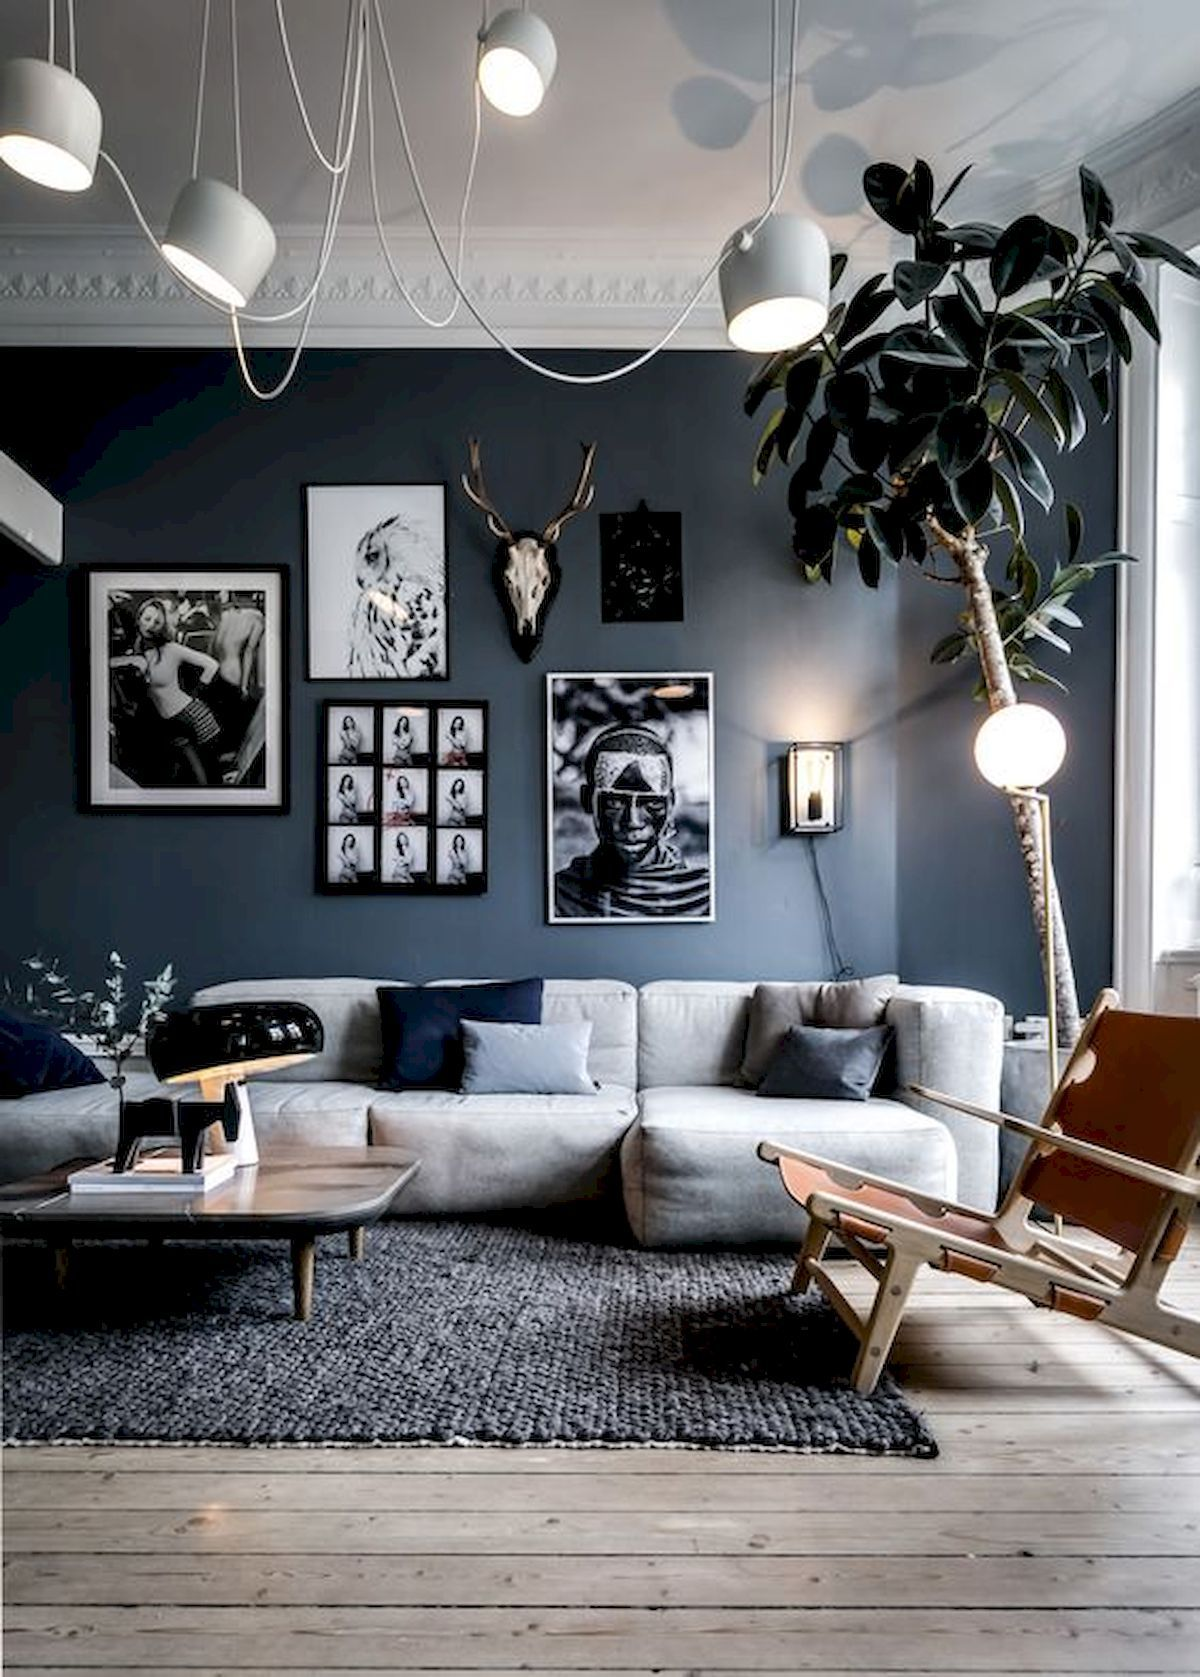 25 Best Farmhouse Small Apartment Decor Ideas Worldeco